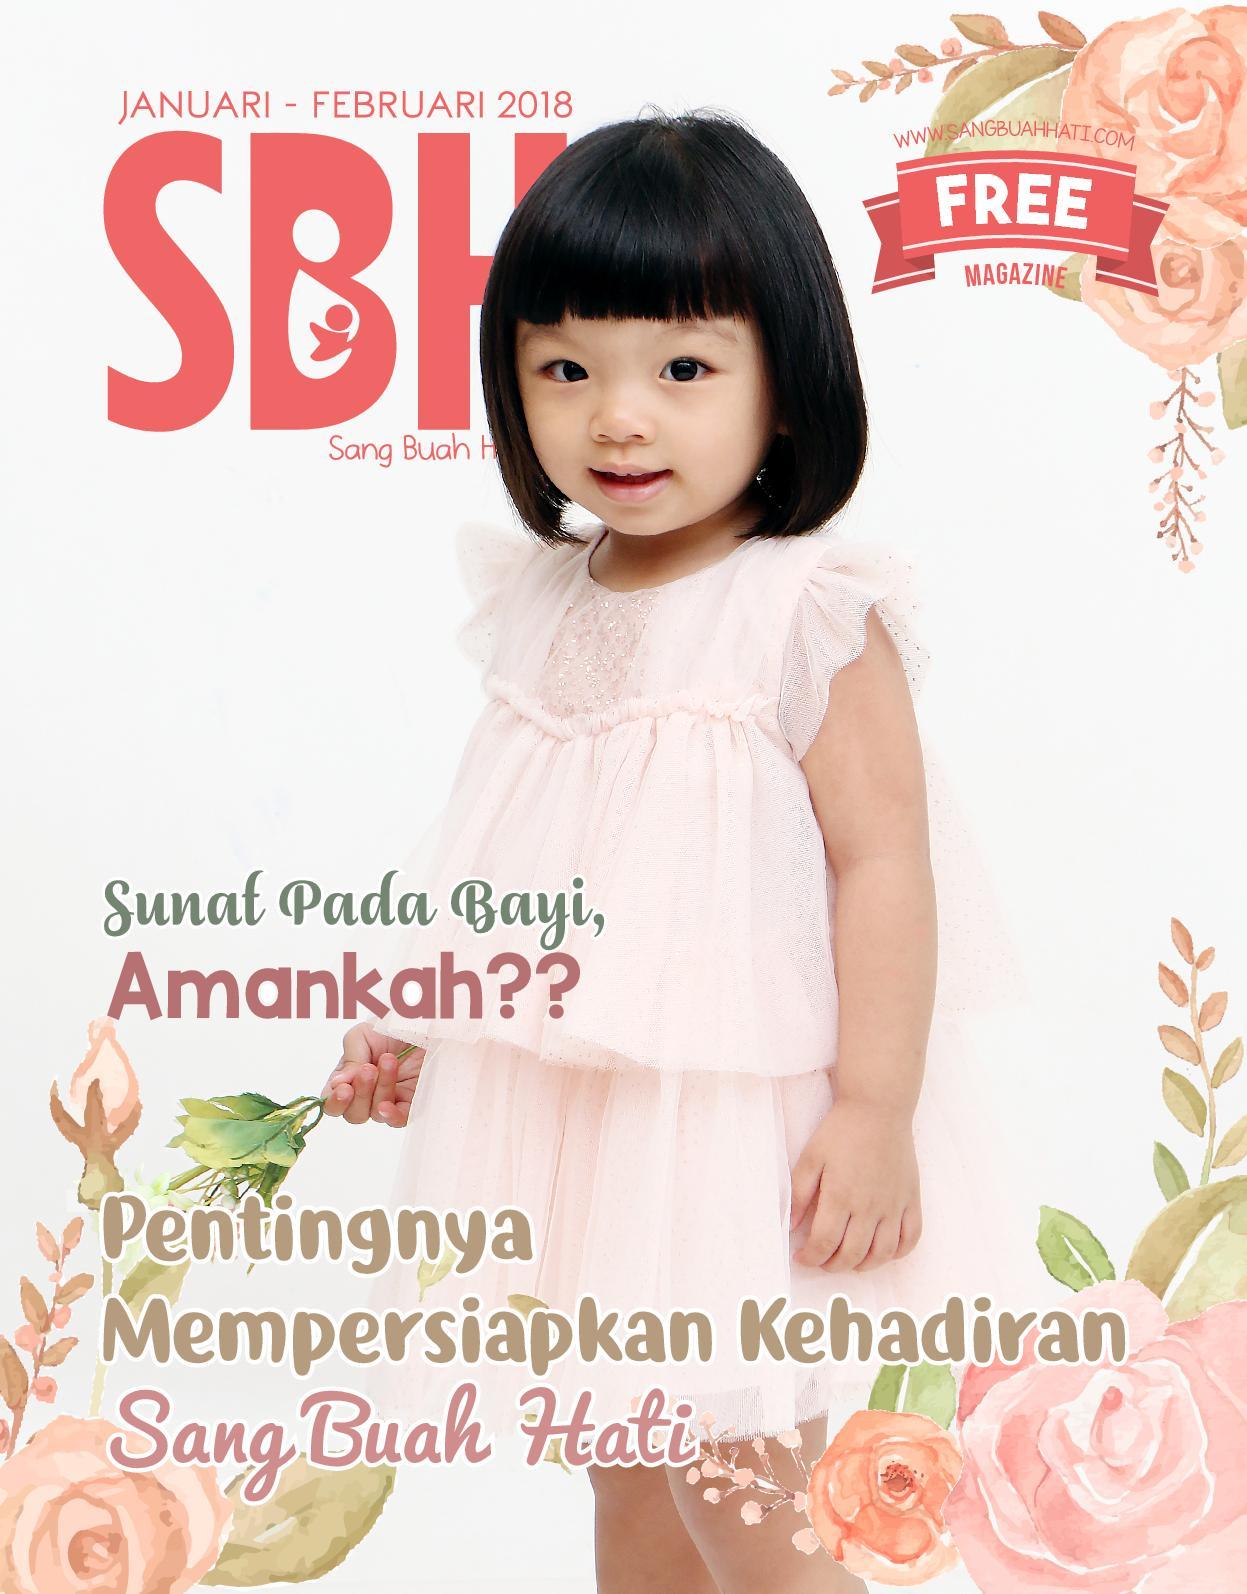 Calamo Sbh Januari Februari 2018 Gendongan Bayi Depan Mbg 6201 Free Ongkir Jabodetabek